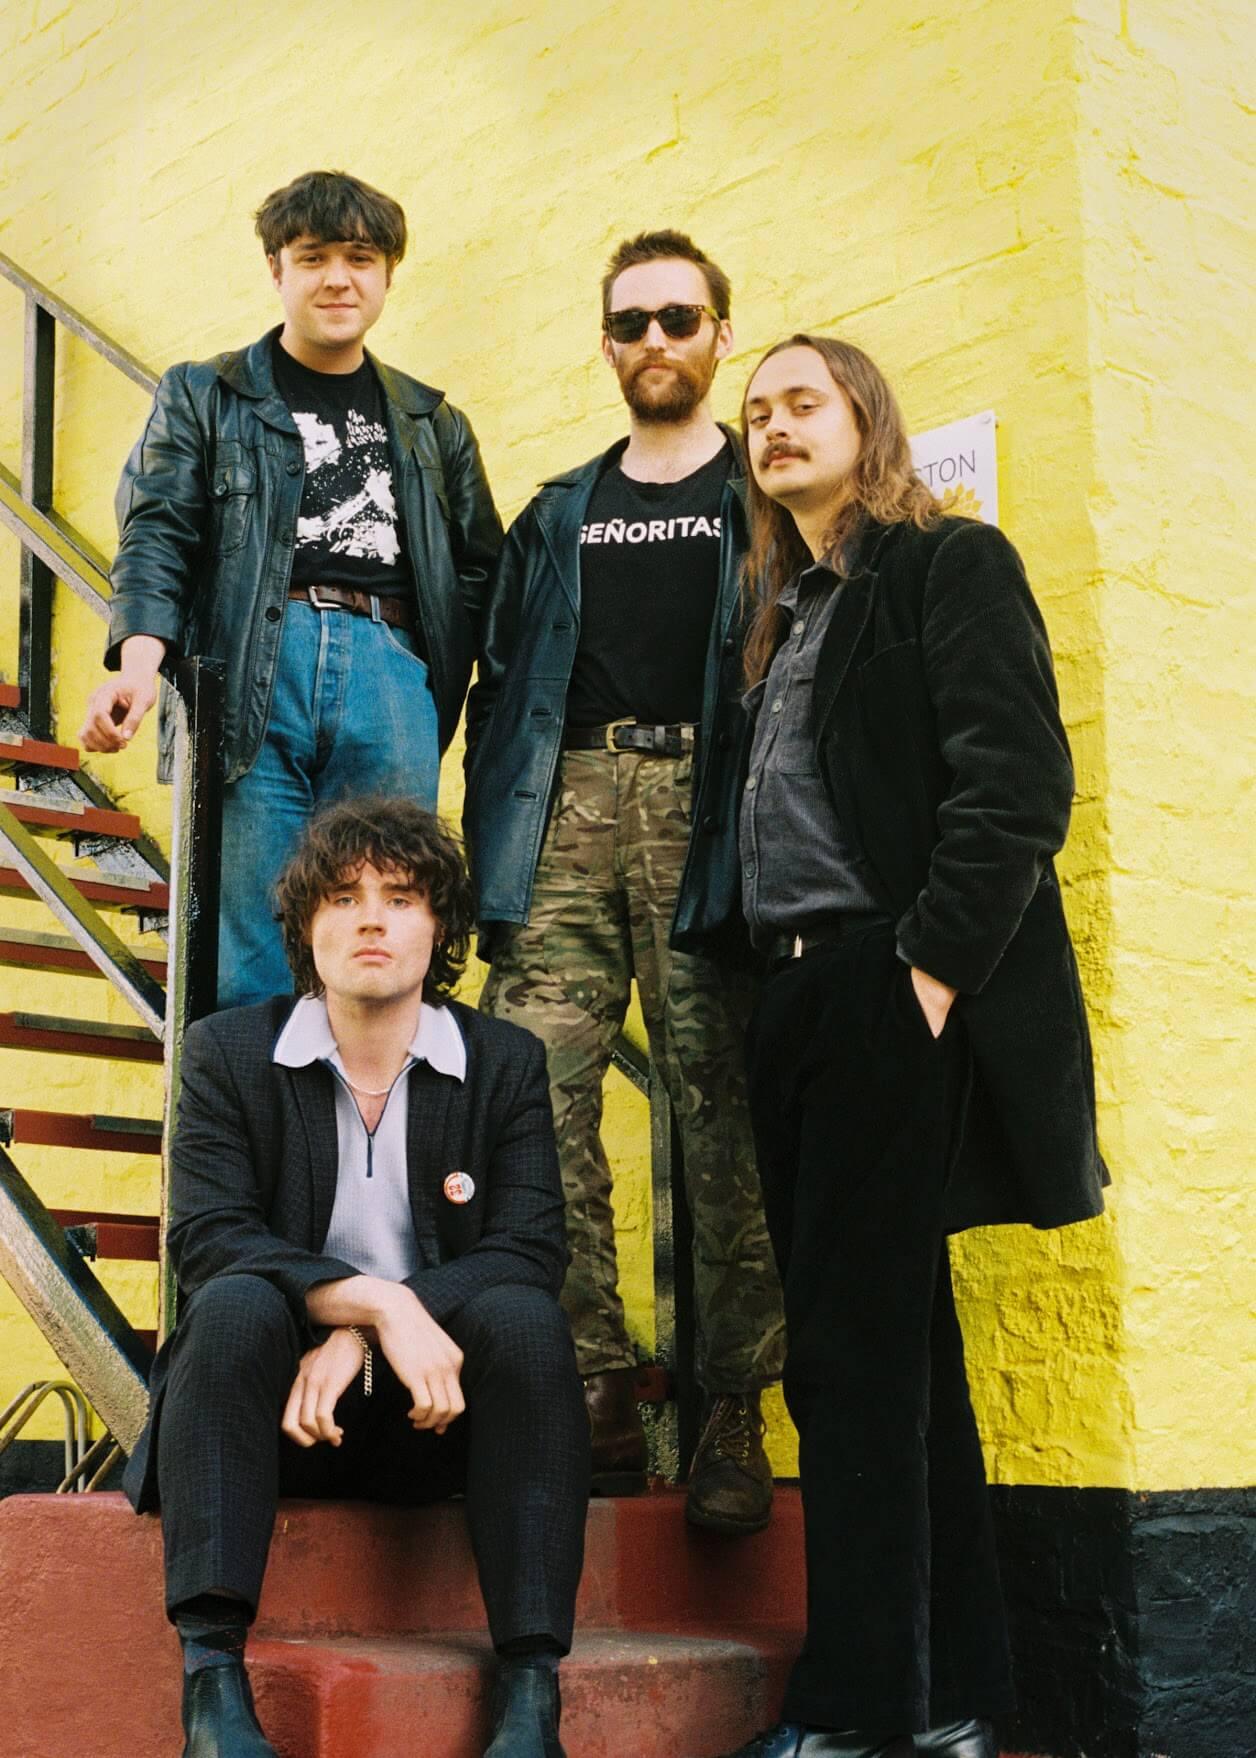 Perspex band photo - Underground blog